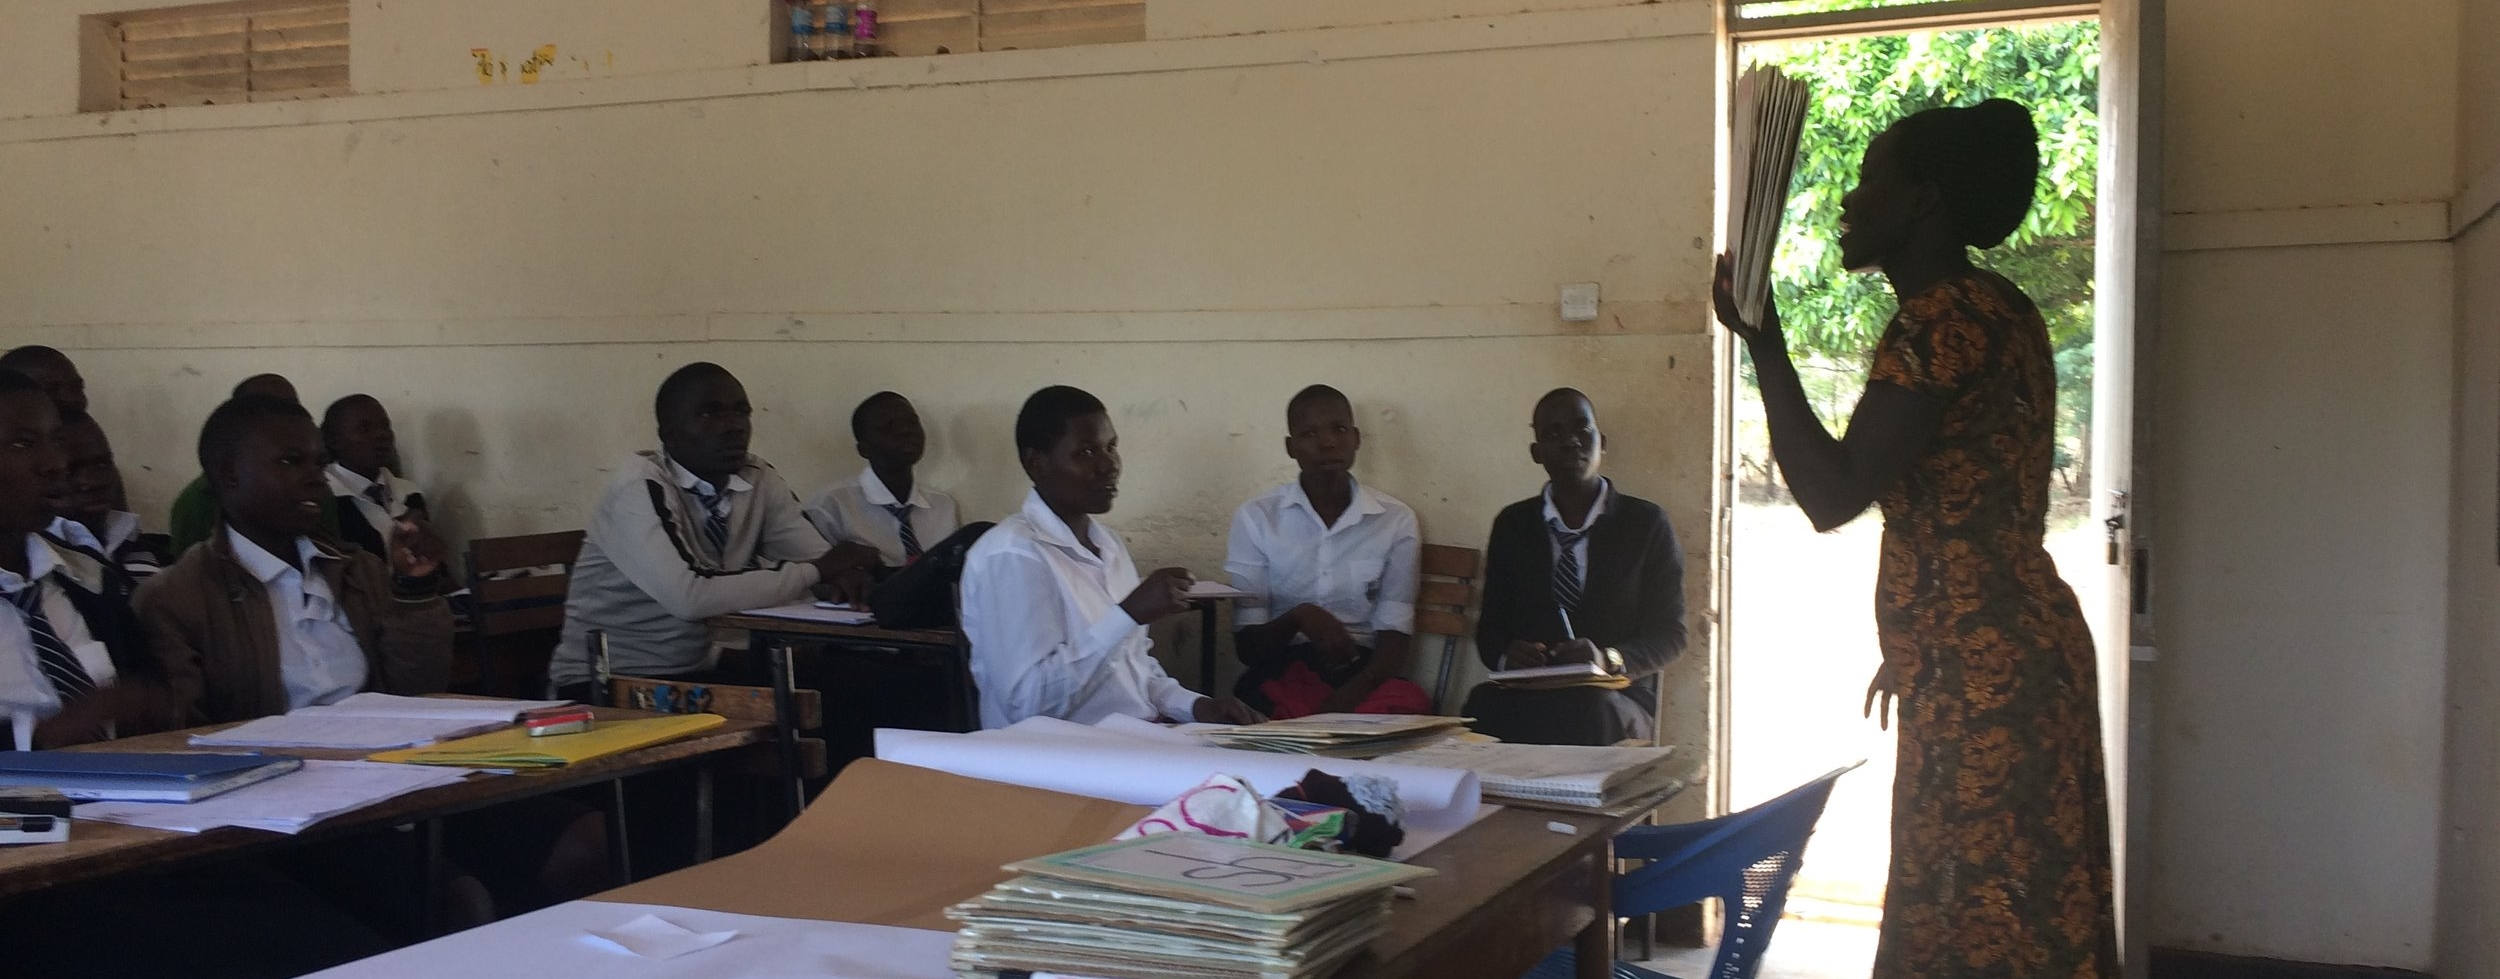 Pre-Service Teacher Training -